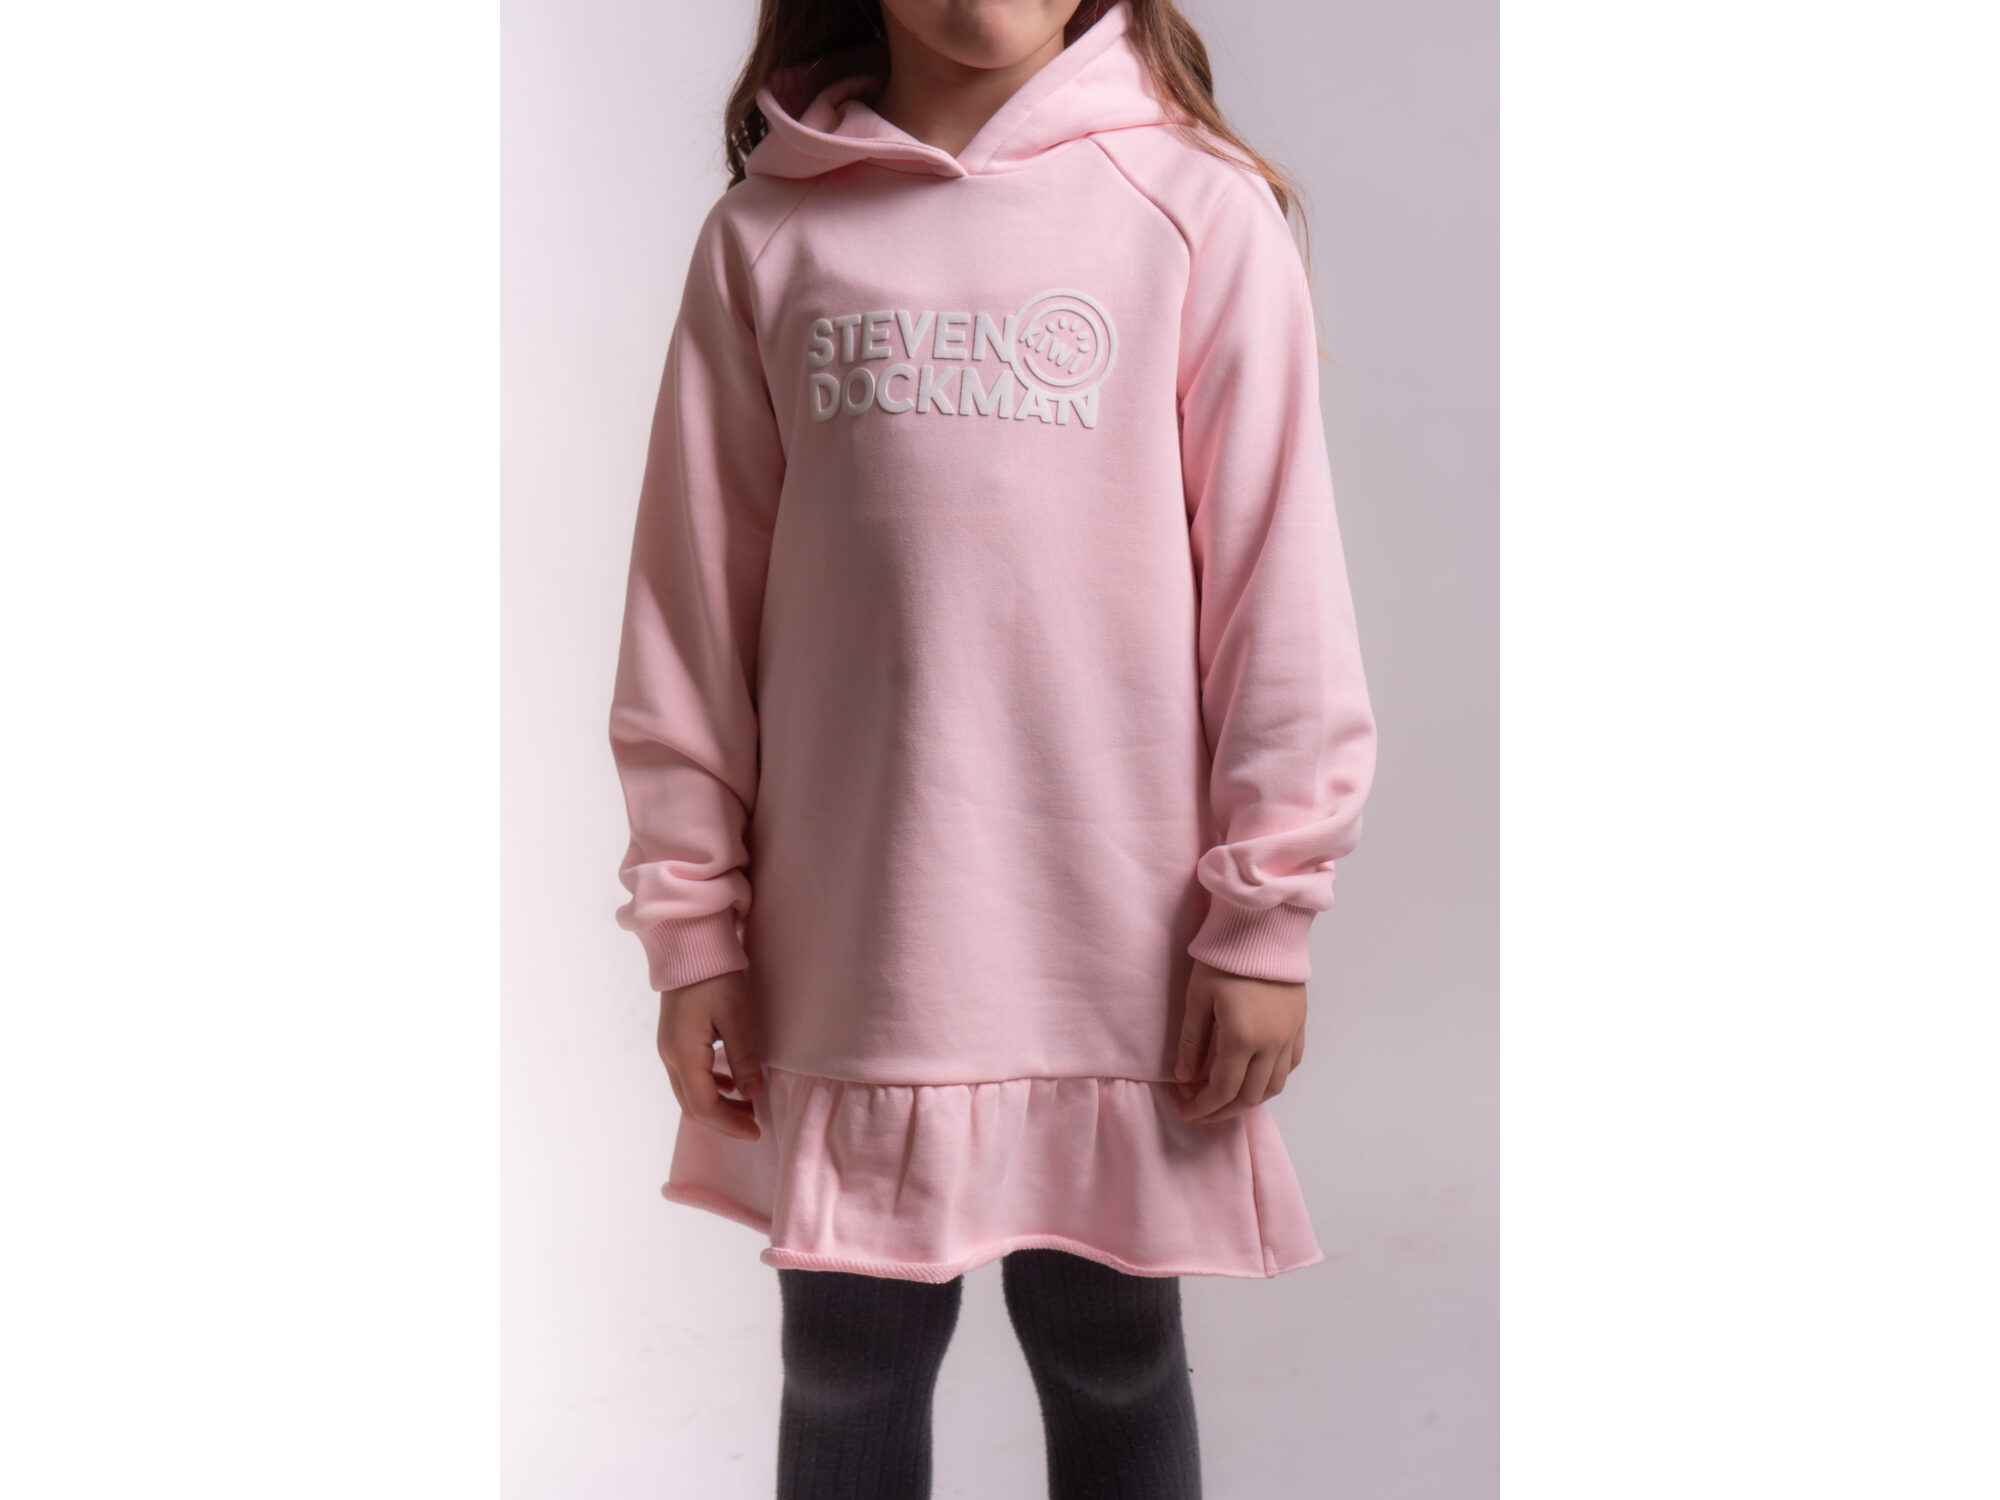 SD x Kiwi Kids dress Pink - Dečija majica/dukserica